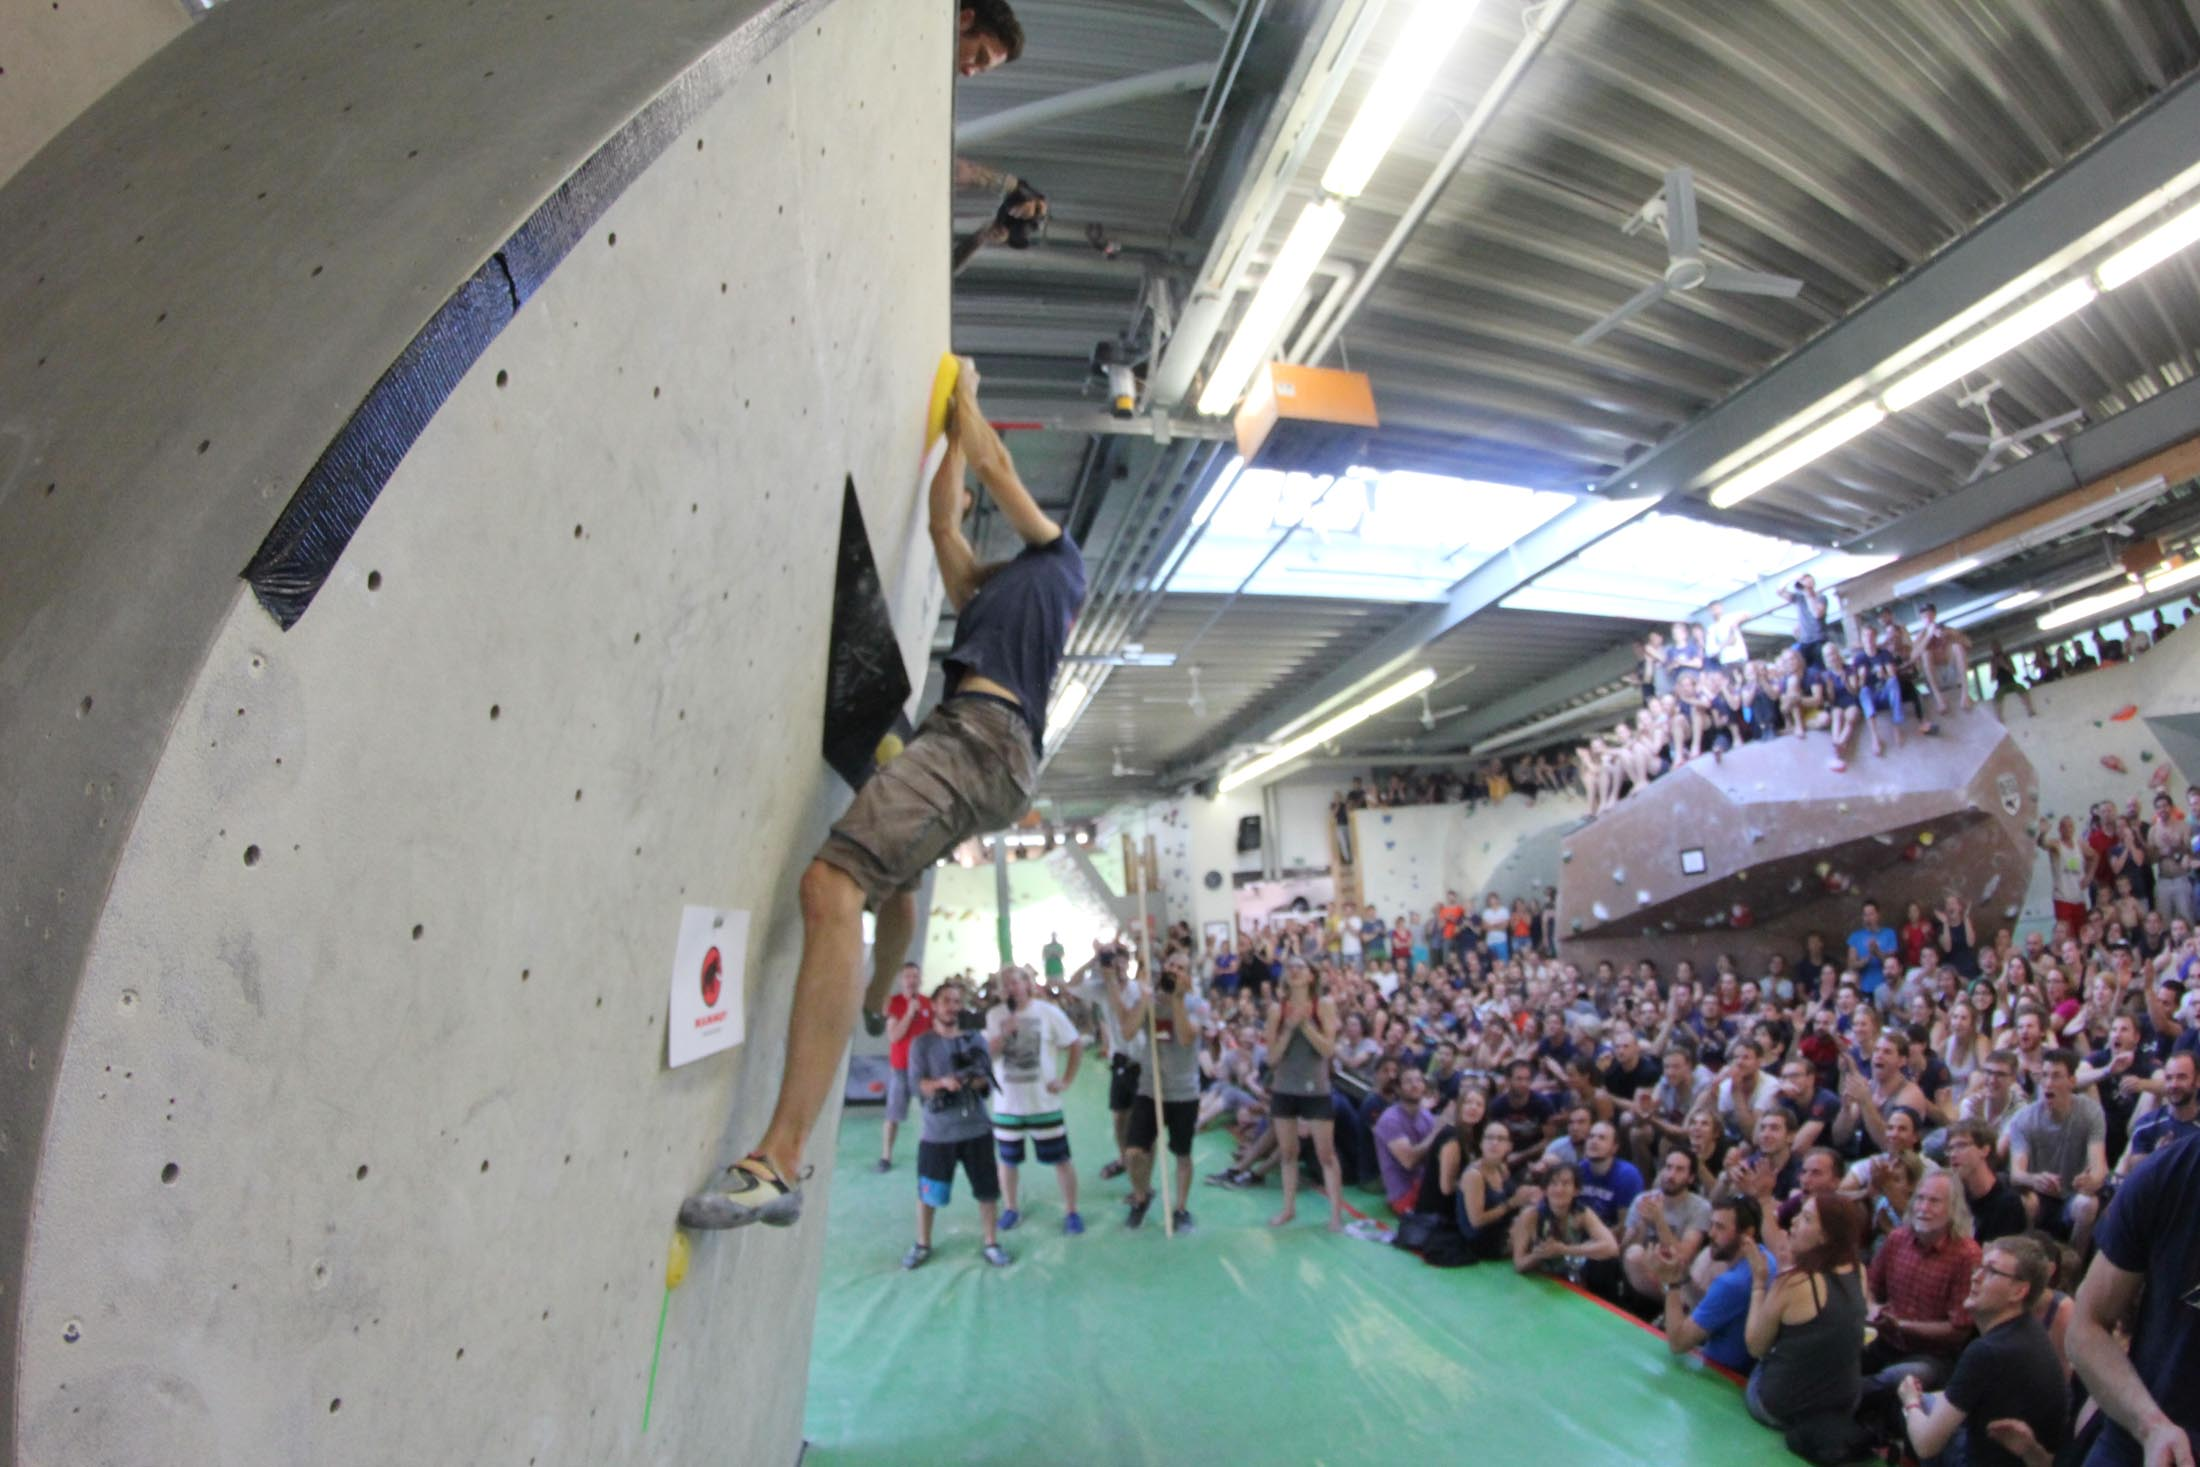 Finale, internationaler bouldercup Frankenjura 2016, BLOCKHELDEN Erlangen, Mammut, Bergfreunde.de, Boulderwettkampf07092016550